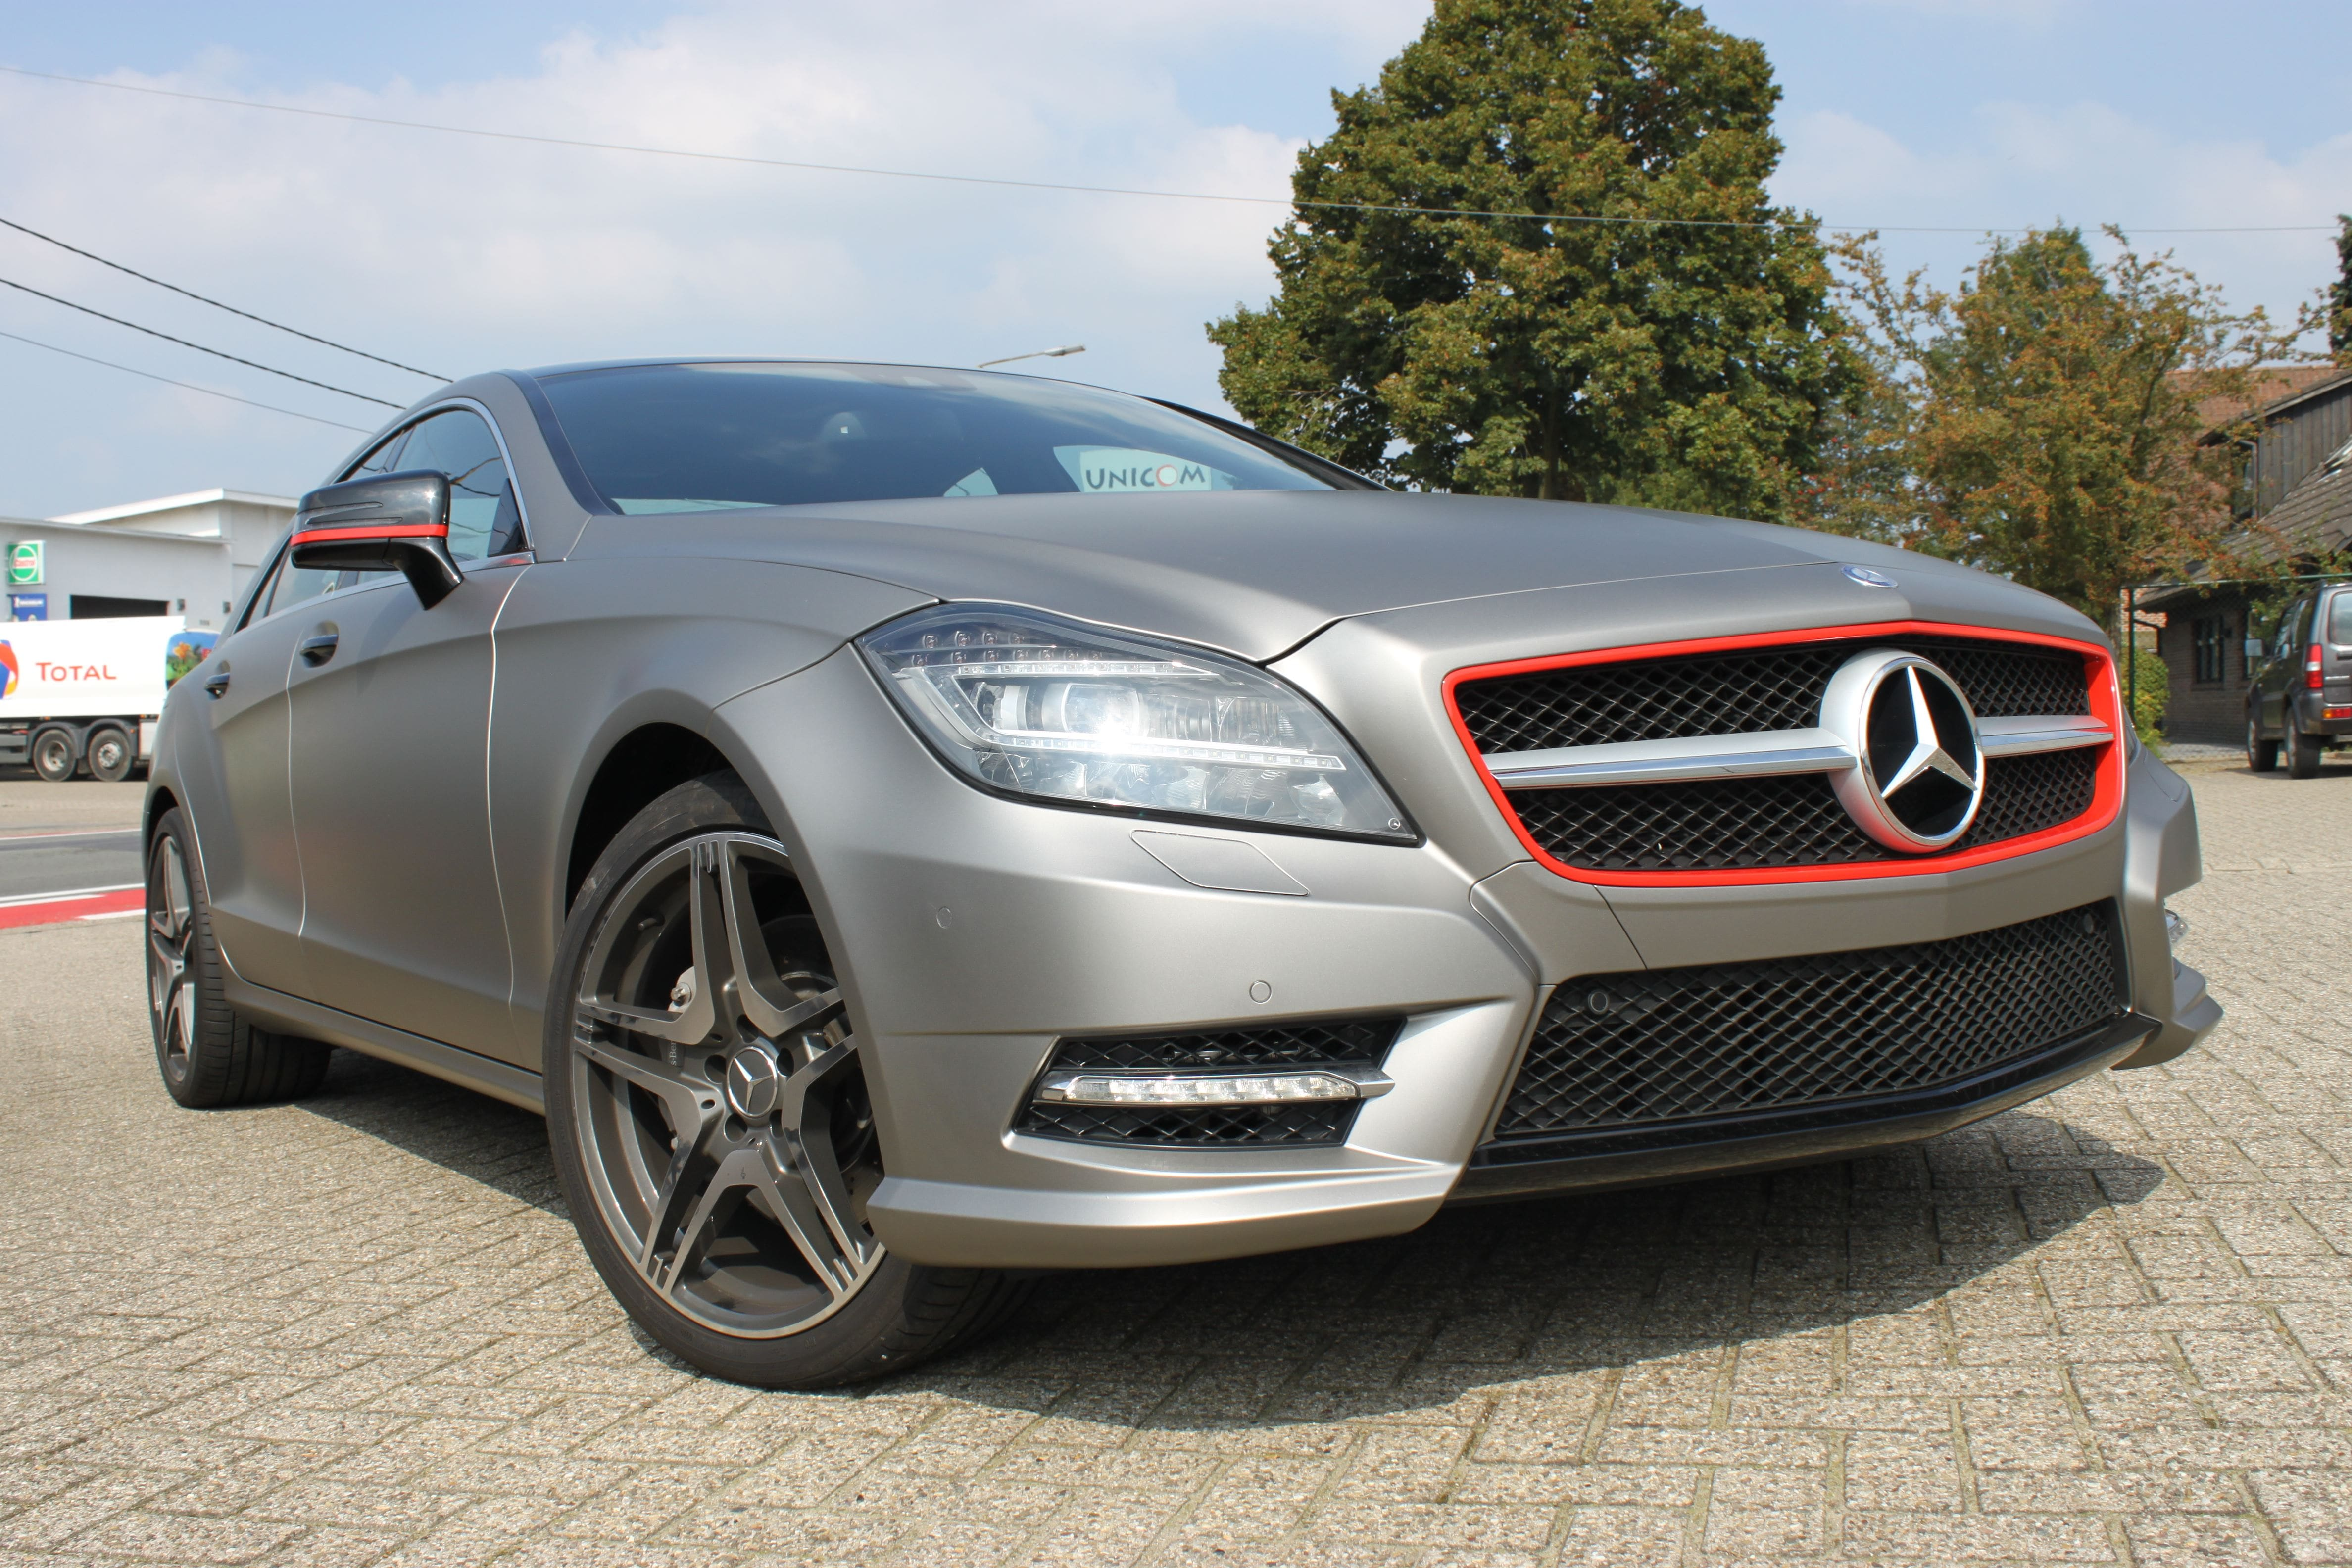 Mercedes CLS met Mat Grey Aluminium Wrap, Carwrapping door Wrapmyride.nu Foto-nr:6162, ©2020